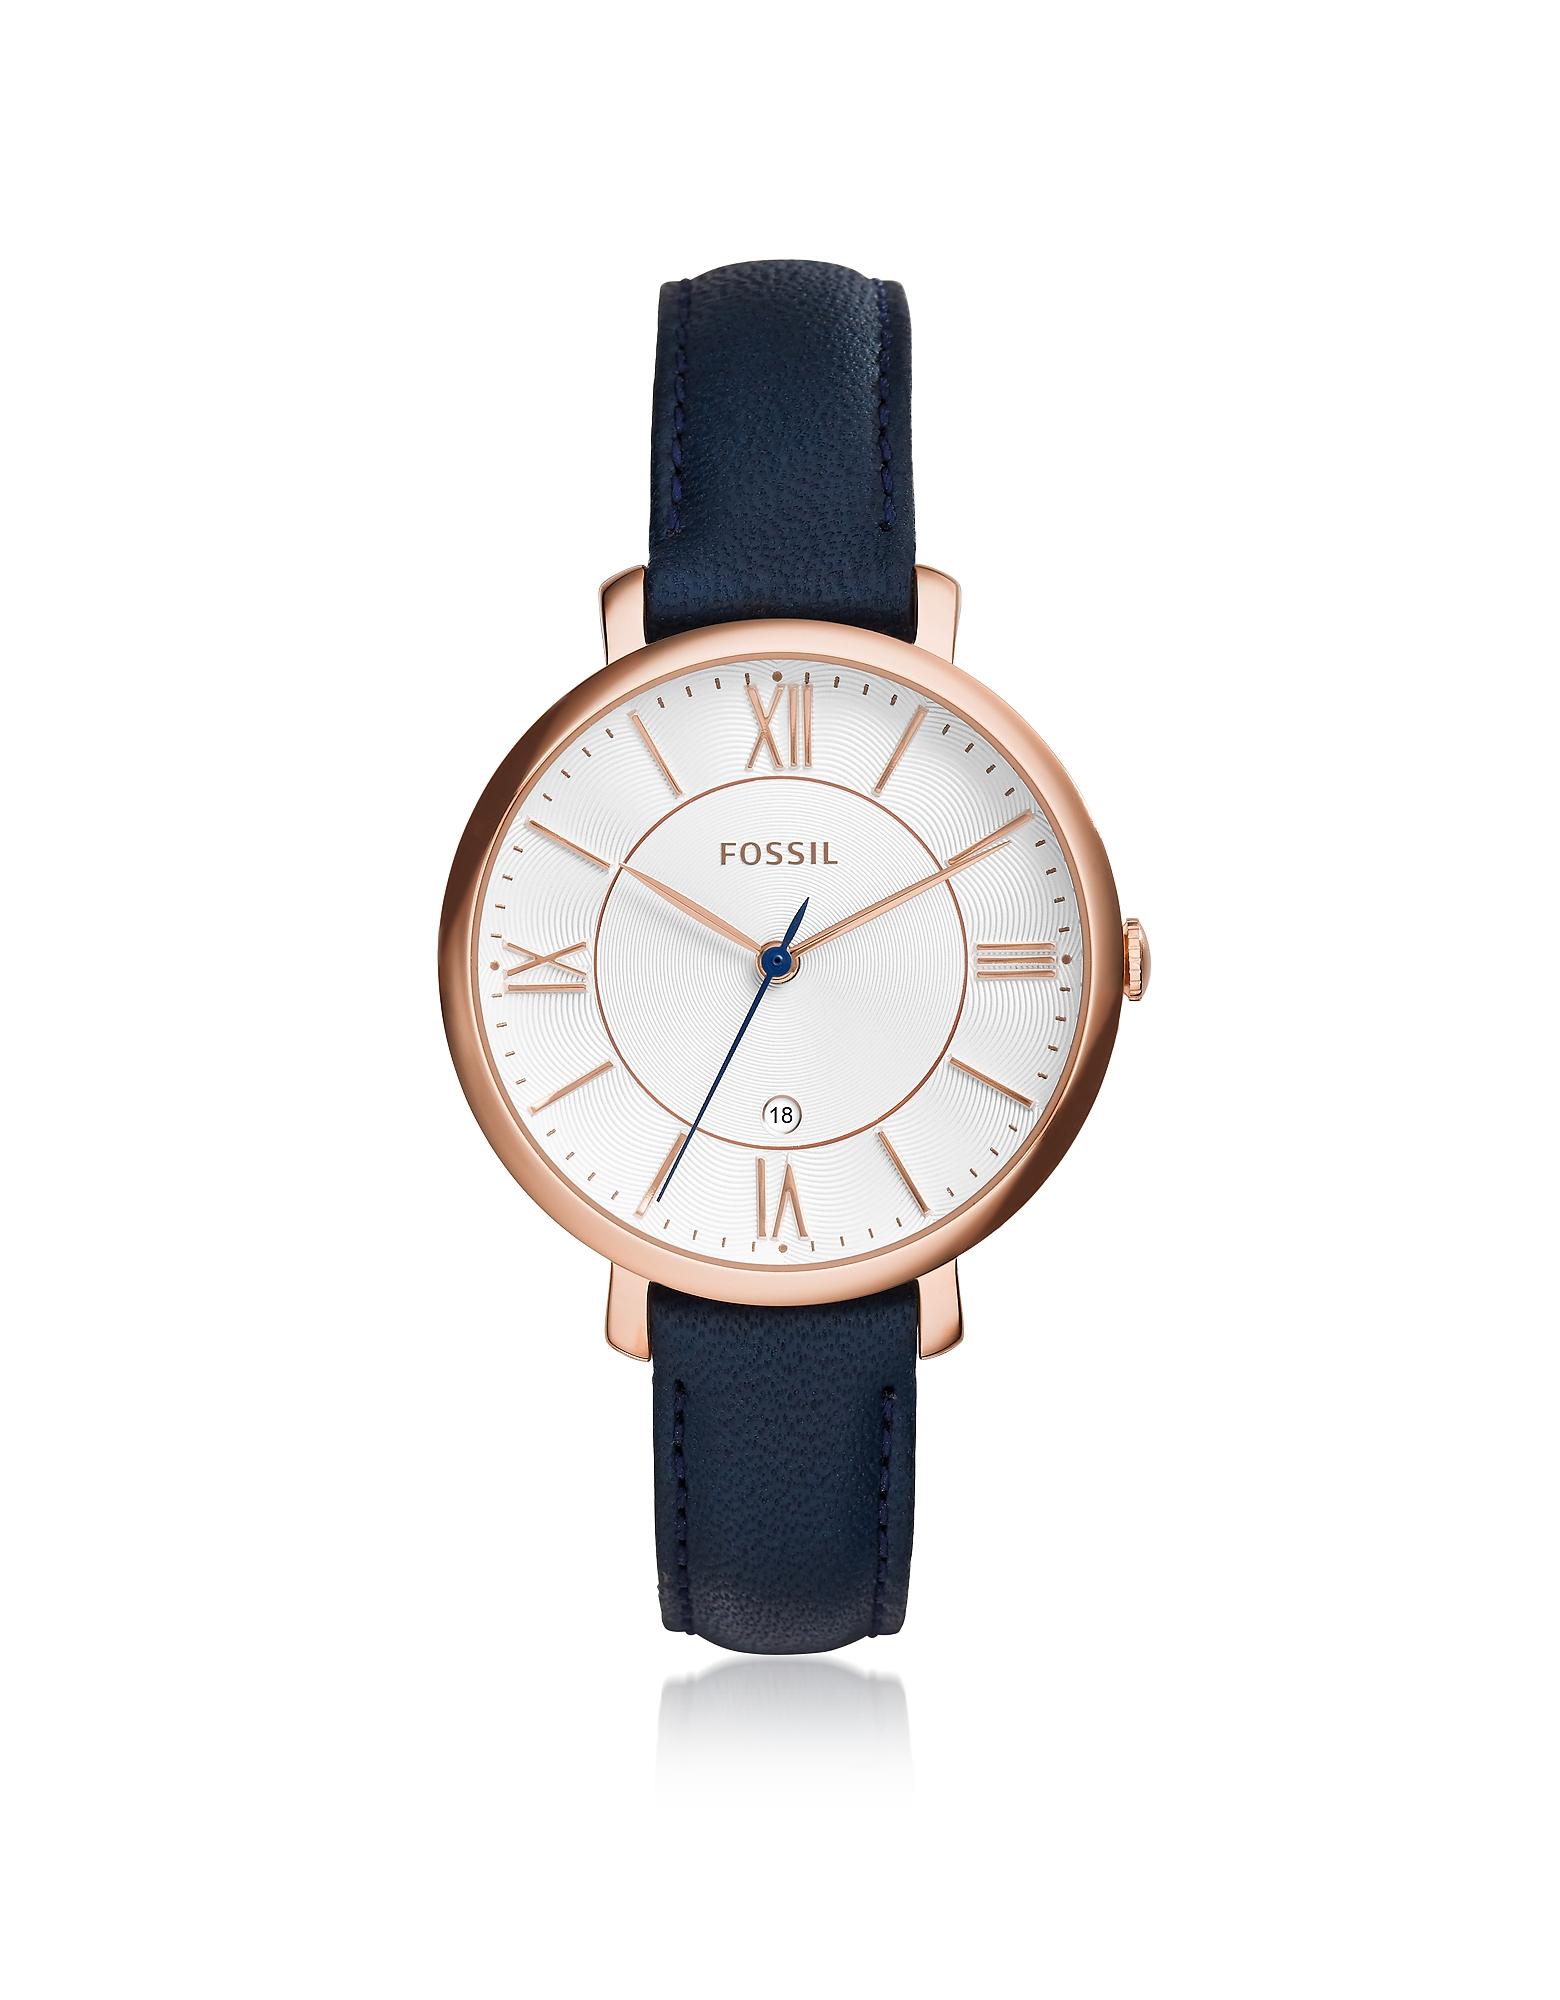 Jacqueline Blue Leather Women's Watch